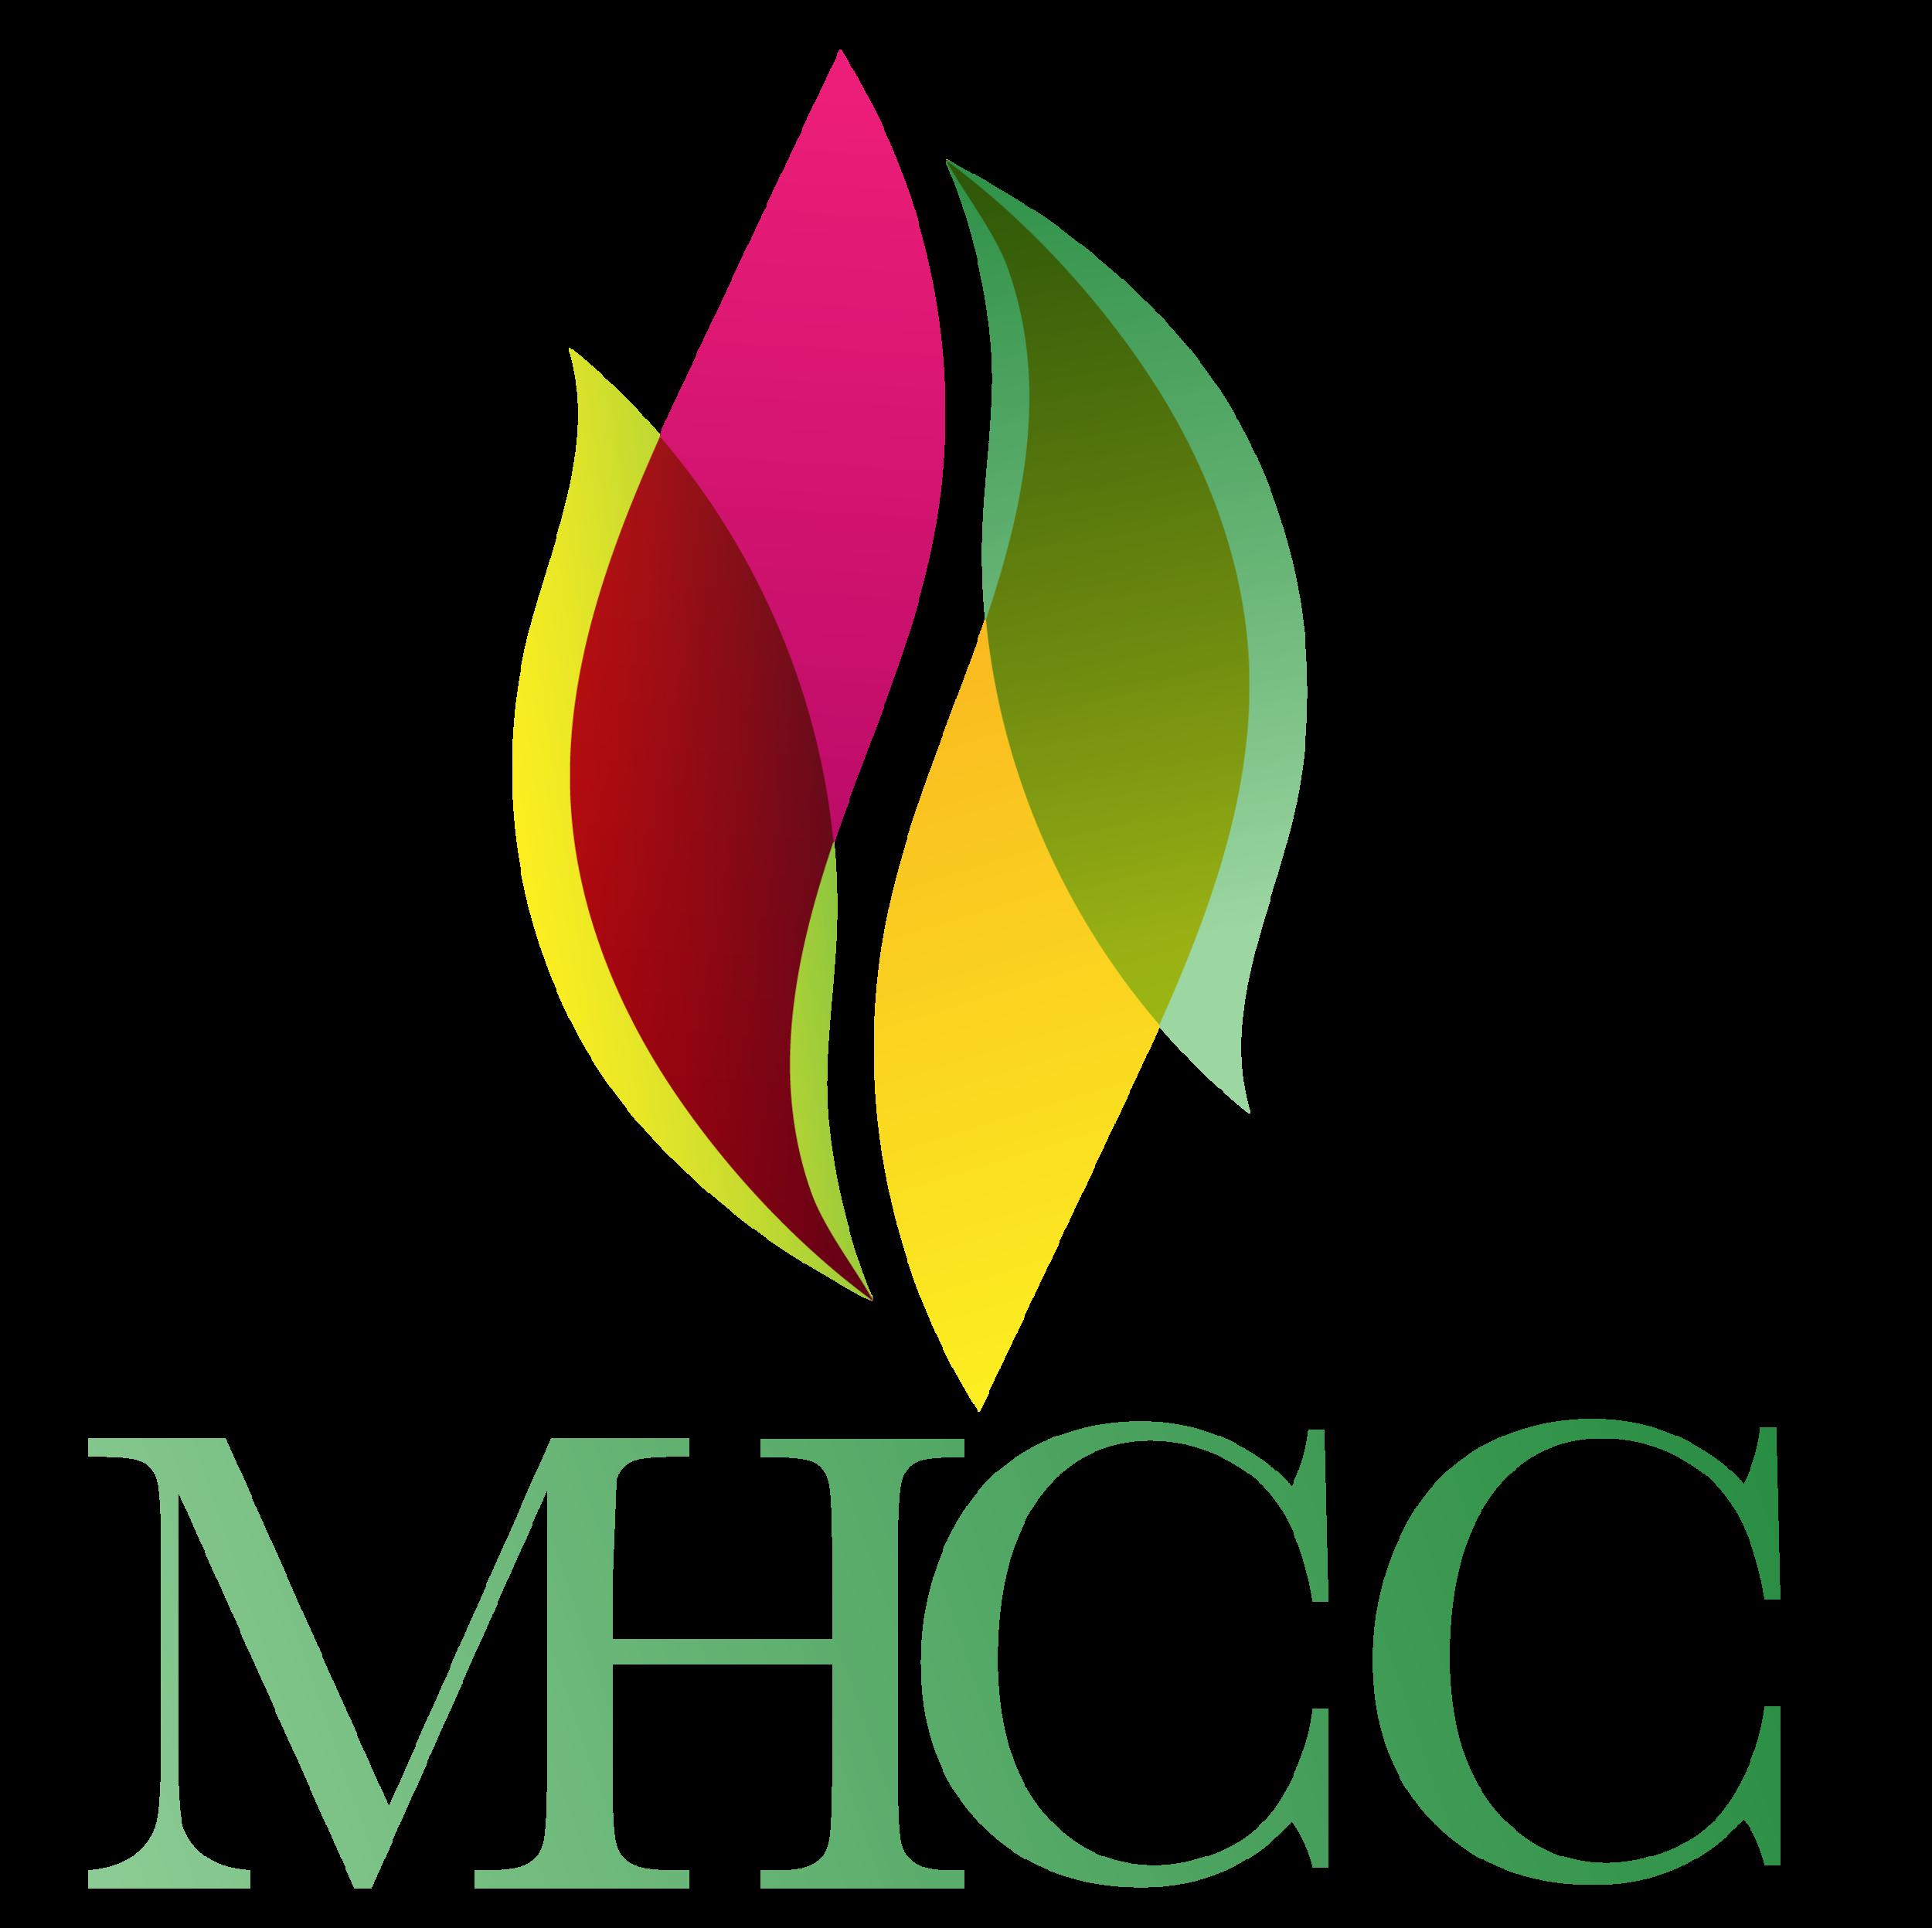 MHCC Logos-03-2.png